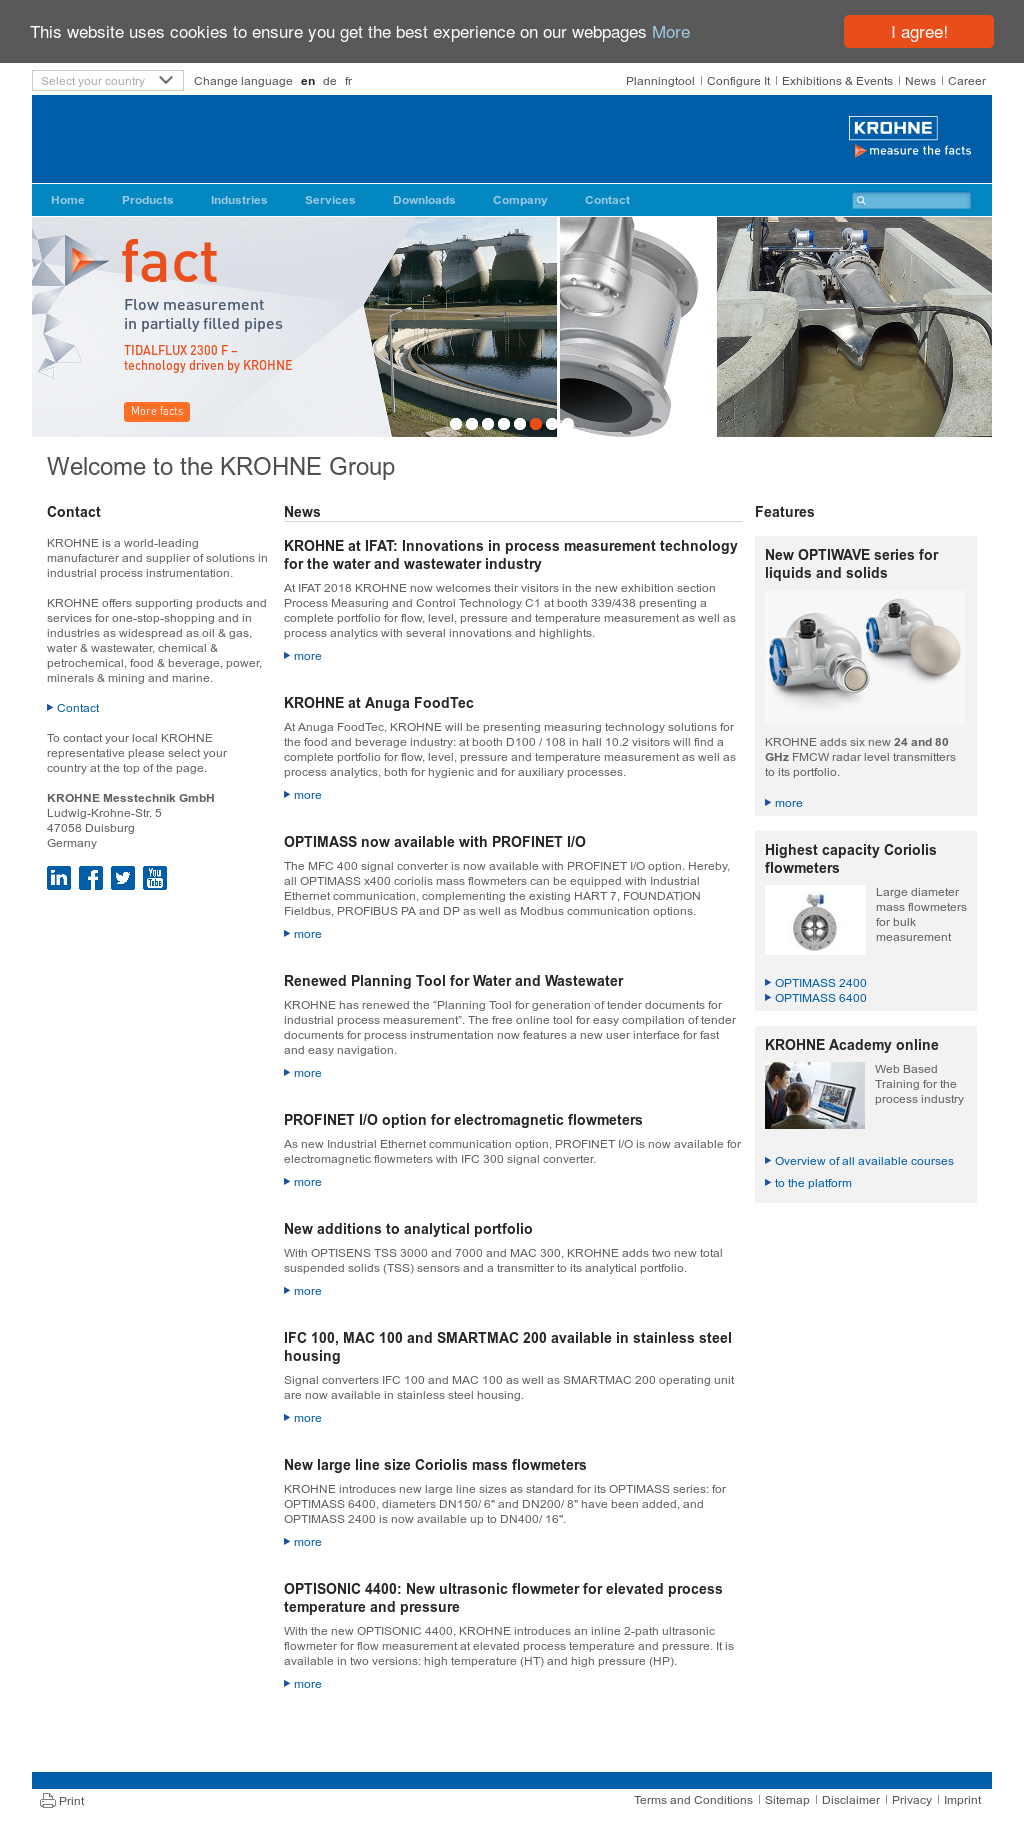 Owler Reports - KROHNE: Krohne to Feature Non-Contact Radar